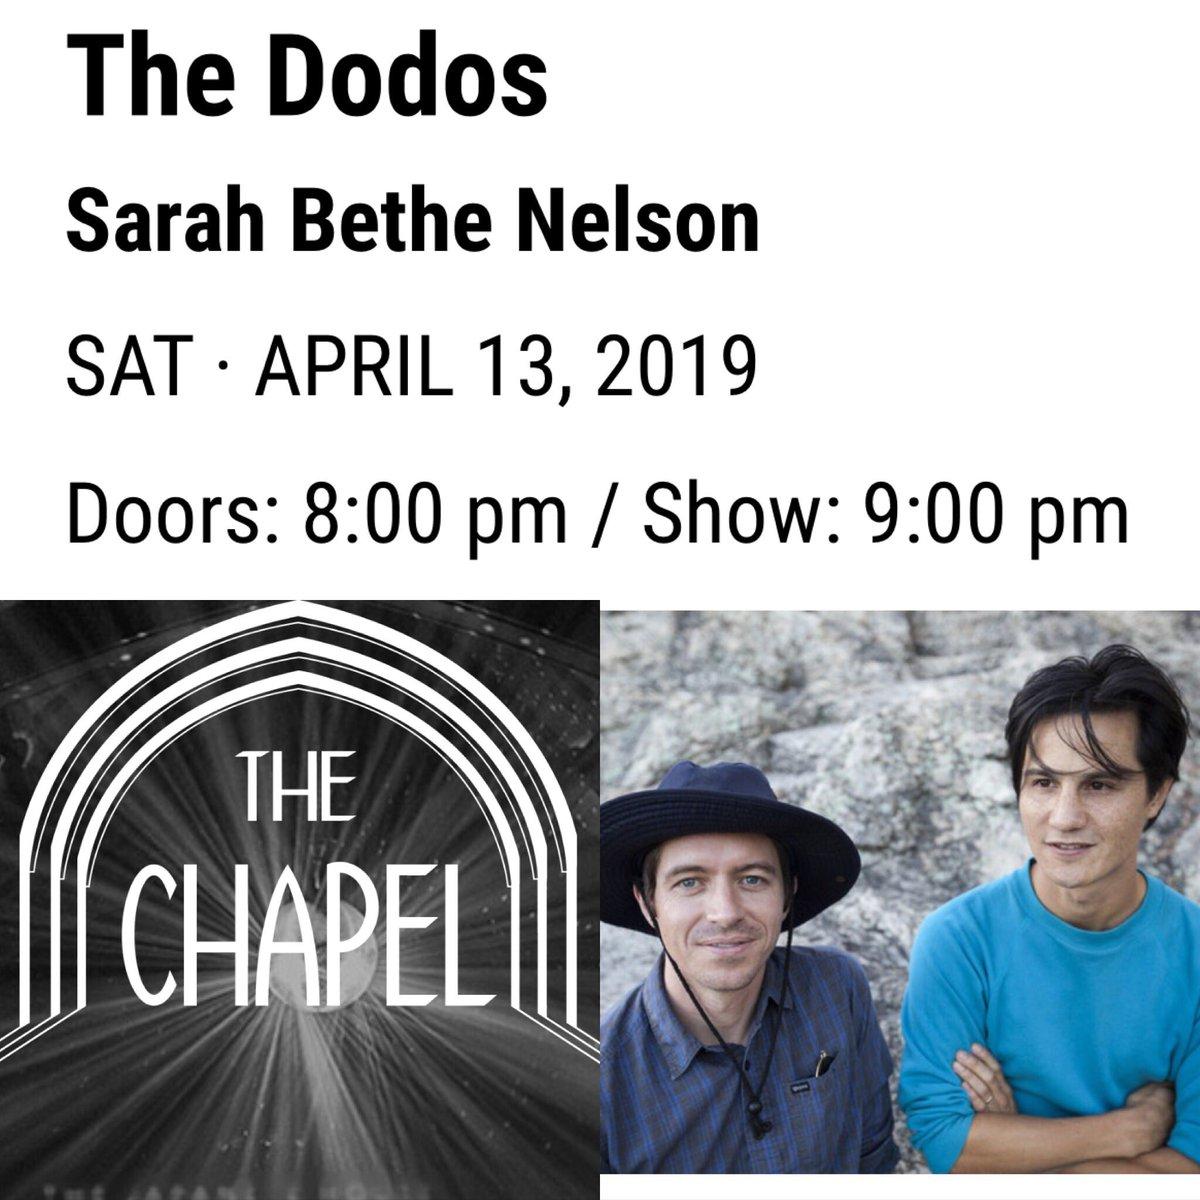 The Dodos (@TheDodos) | Twitte...